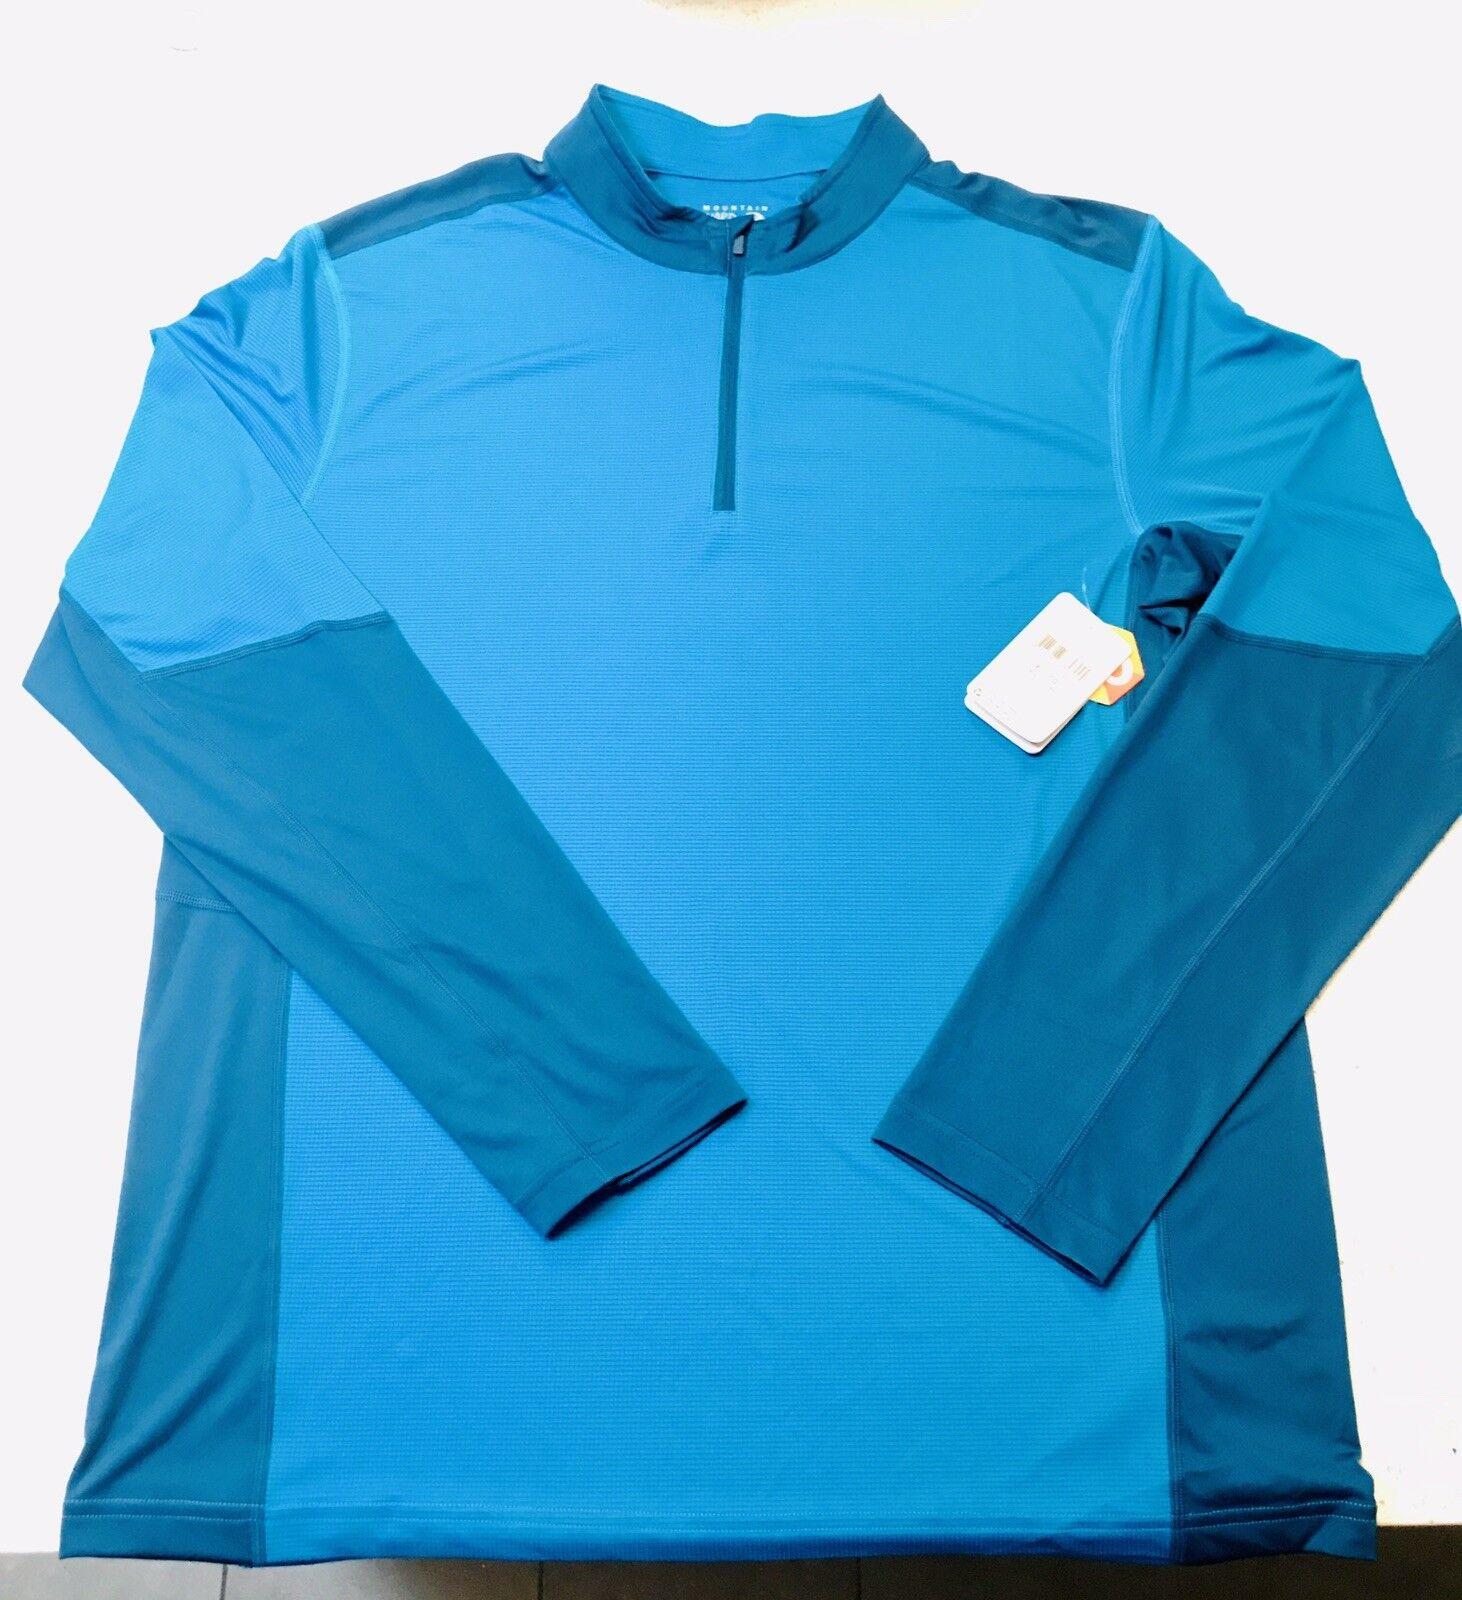 Mountain Hardwear Outdoor L S  Half Zip Hiking, Neon bluee XL MSRP  55.00  no tax